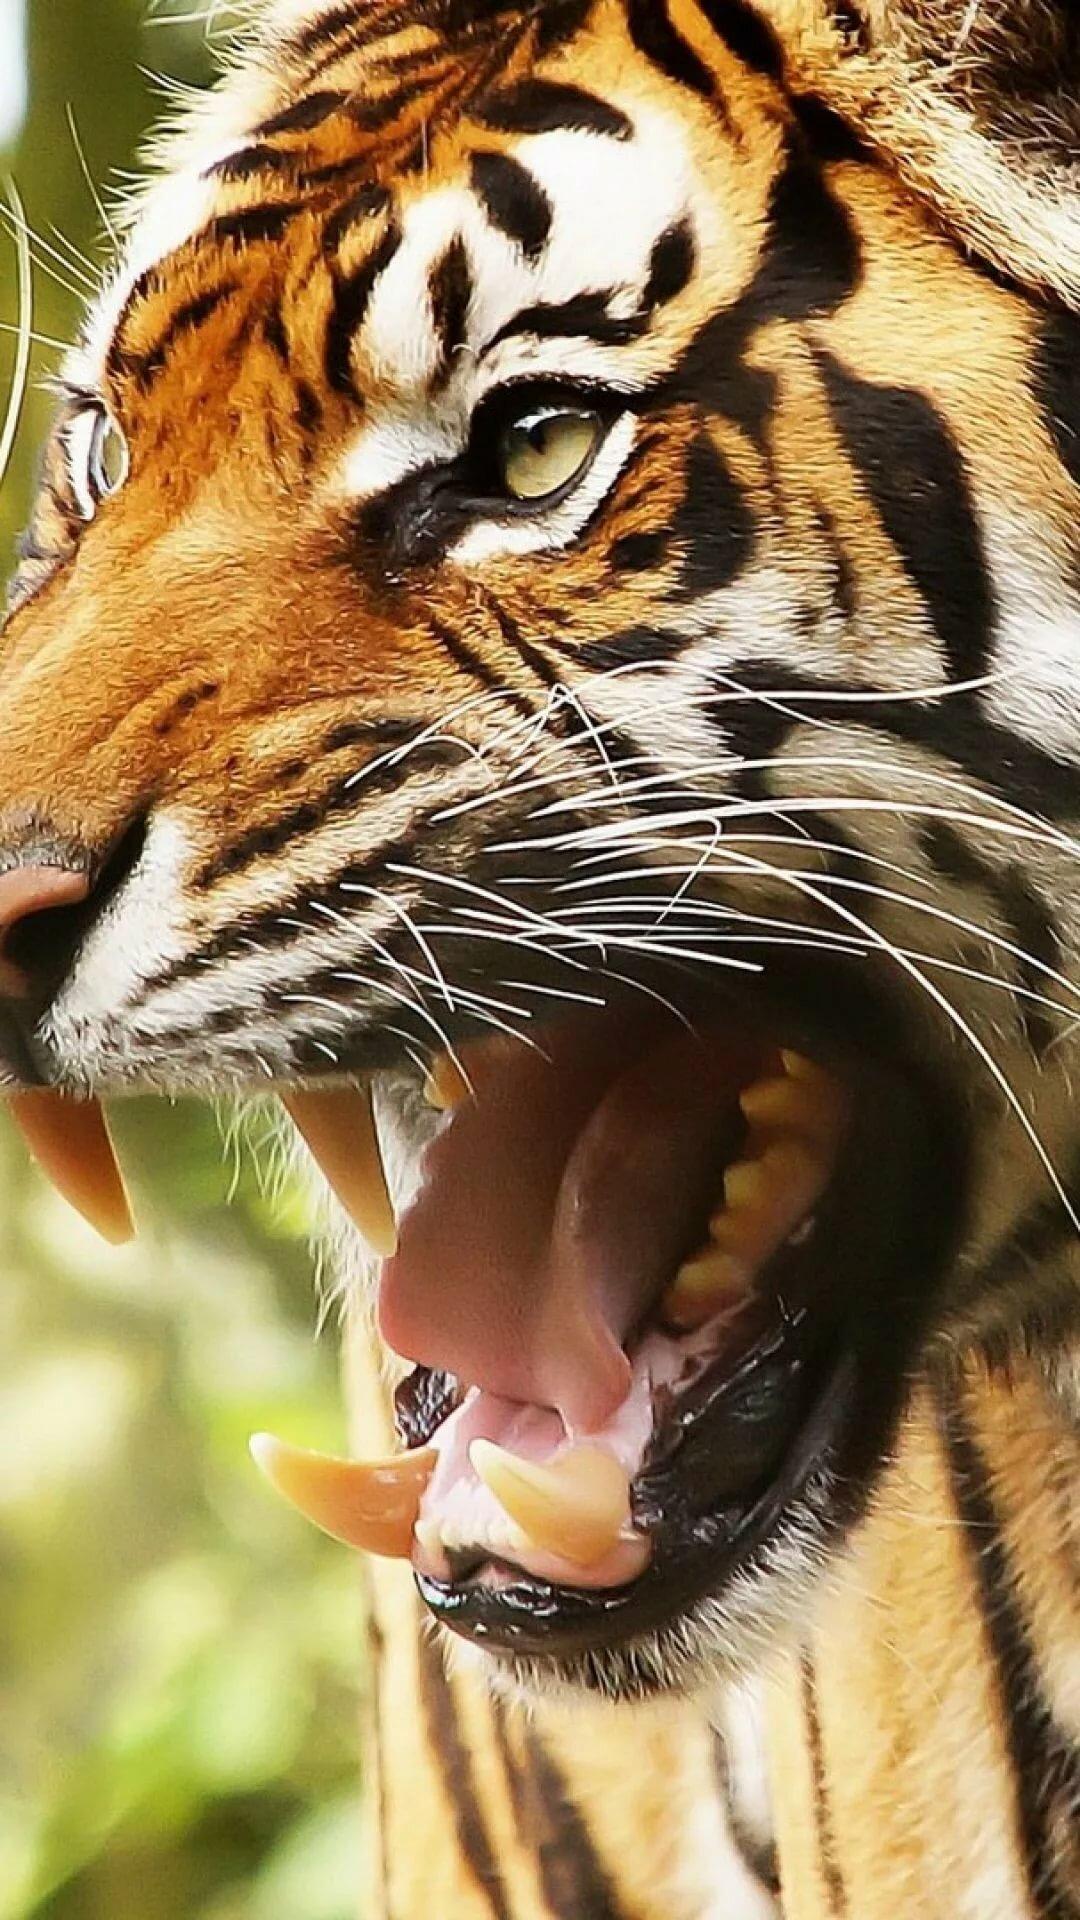 картинки тигр с открытым ртом материалы для создания